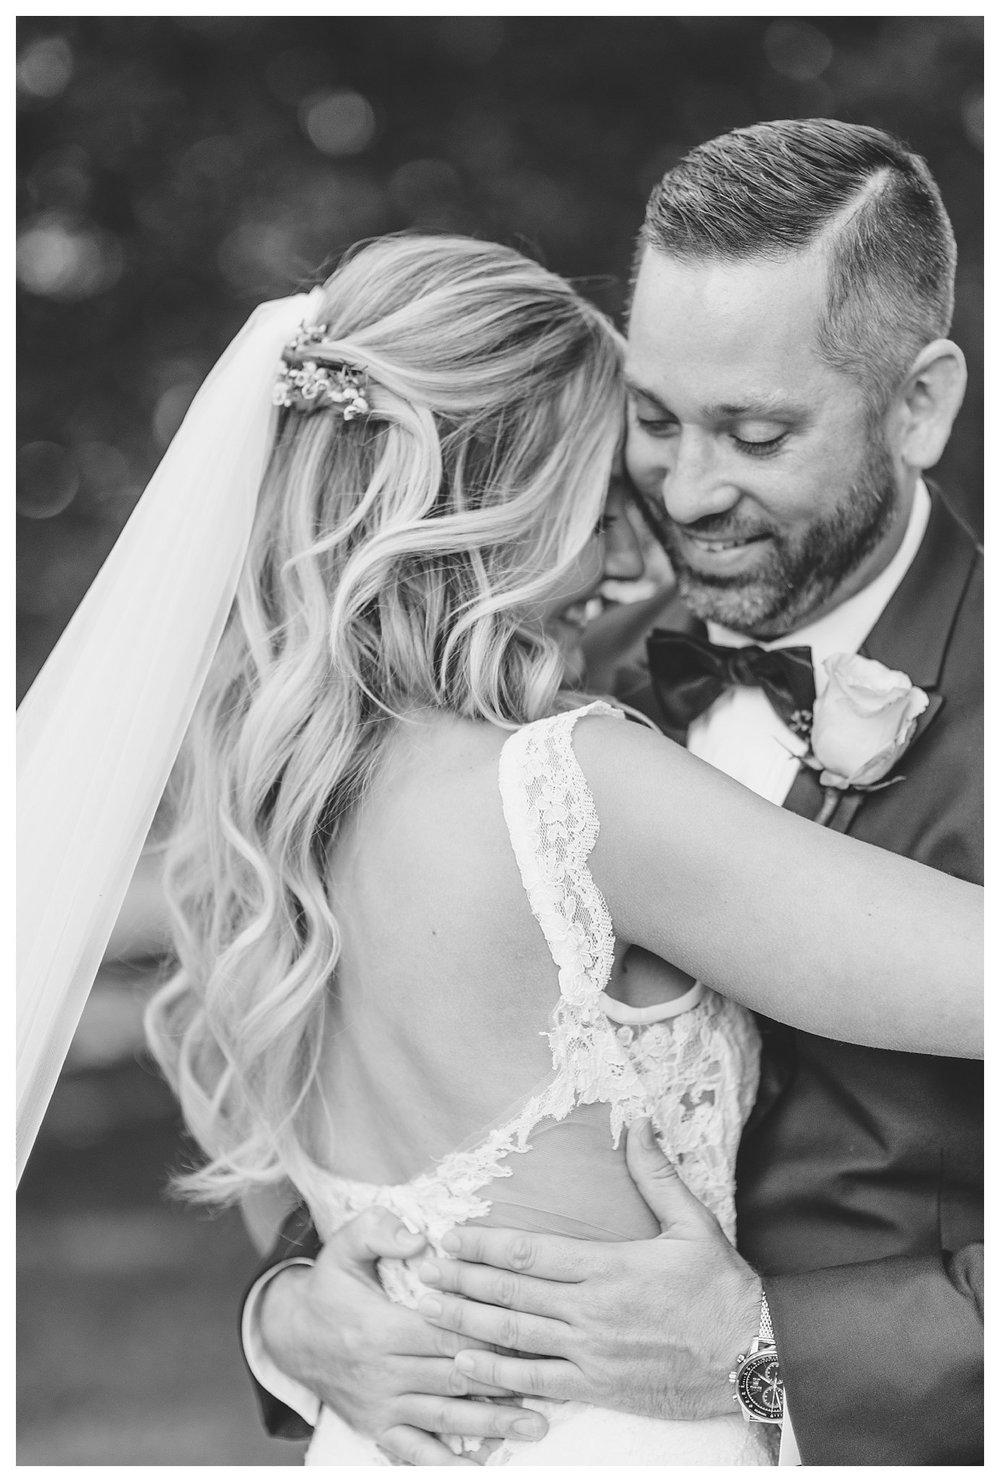 rhinegeist-wedding-everleigh-photography-cincinnati-wedding-photographer-the-singhoff-wedding-26